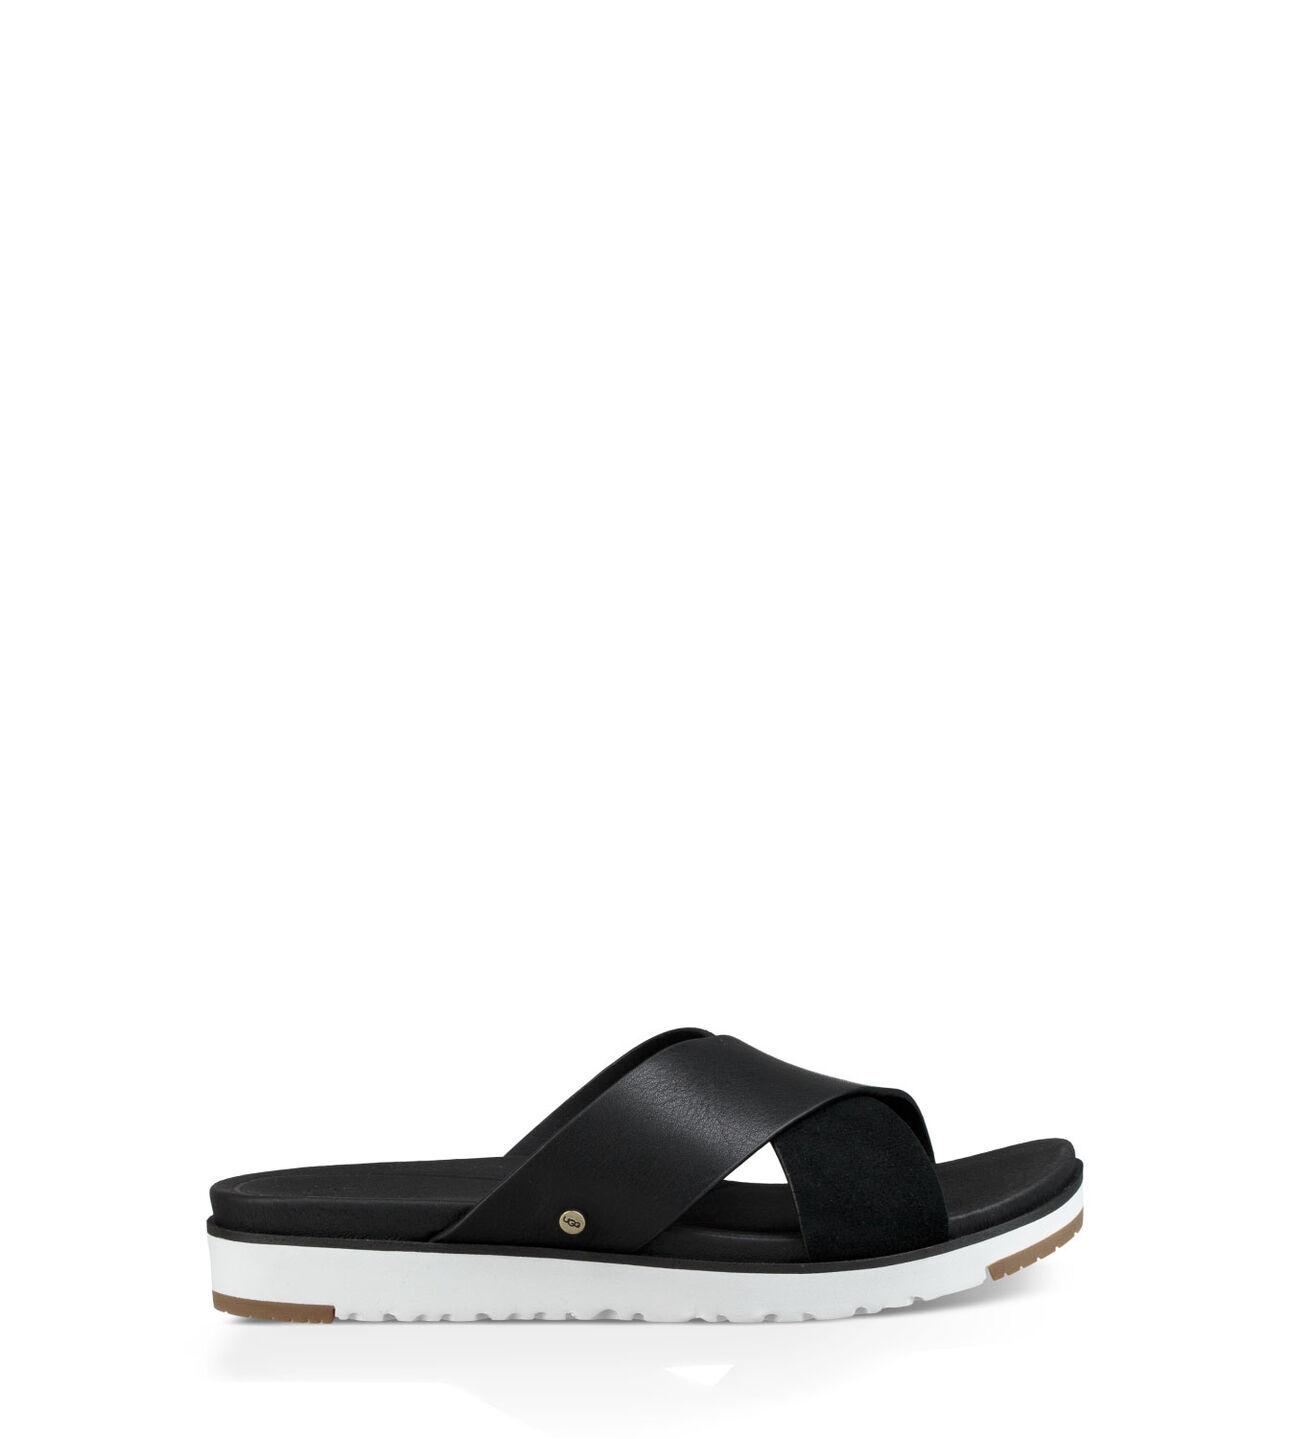 3e73a0009323 UGG Kari Sandals